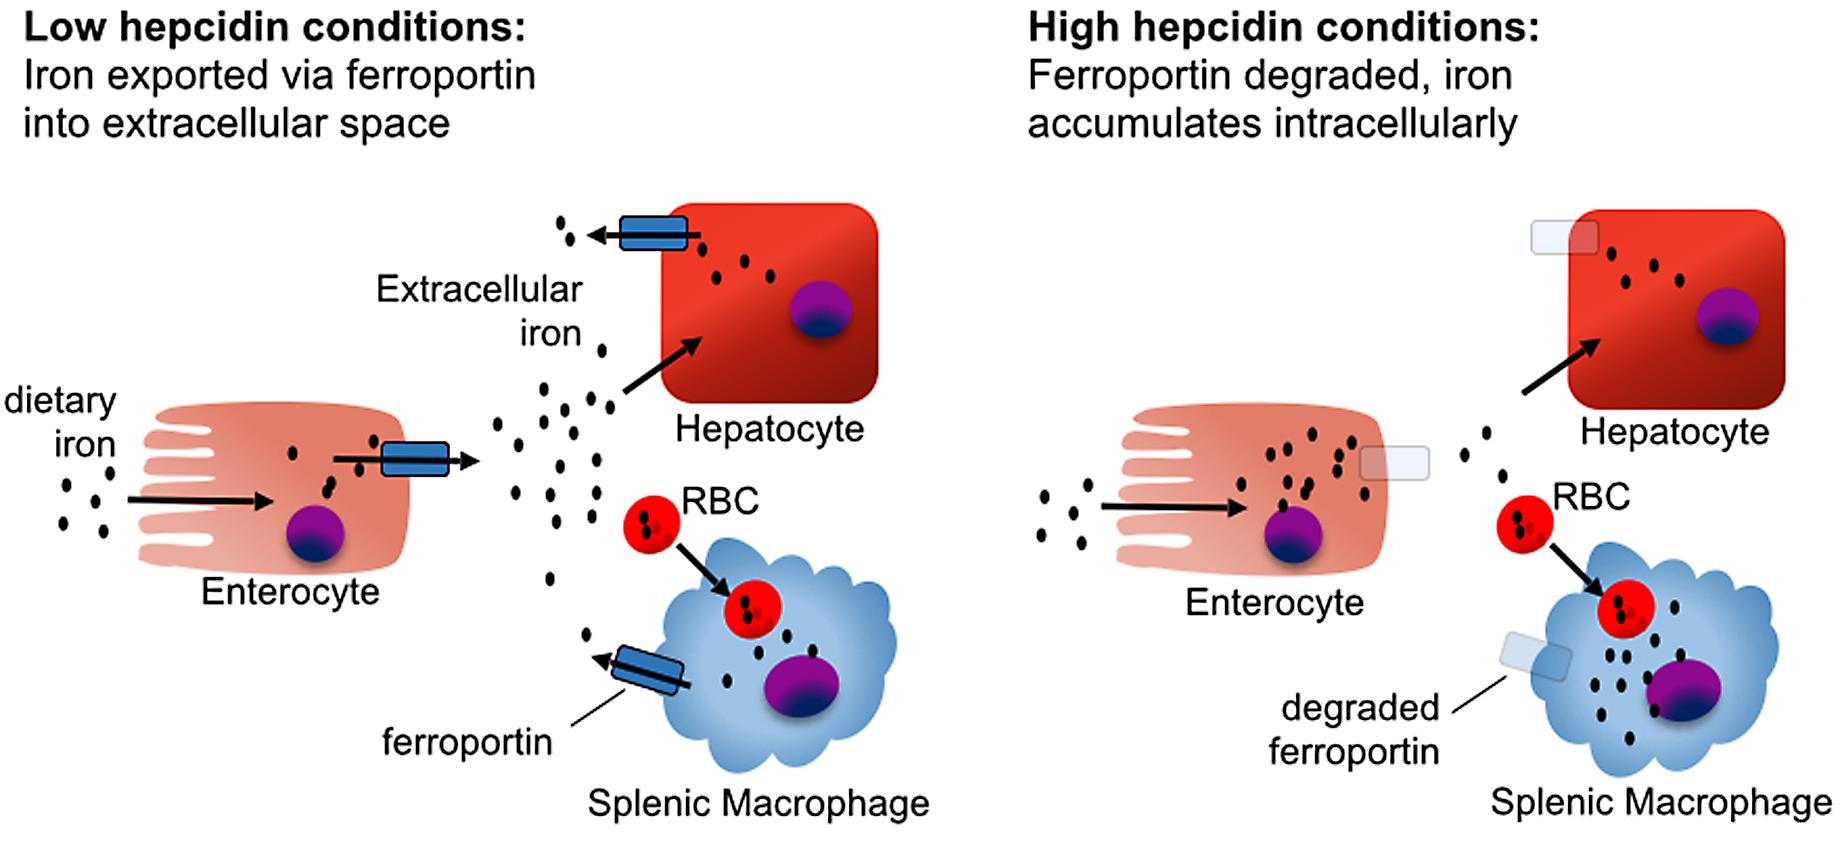 The effect of hepcidin on iron homeostasis.